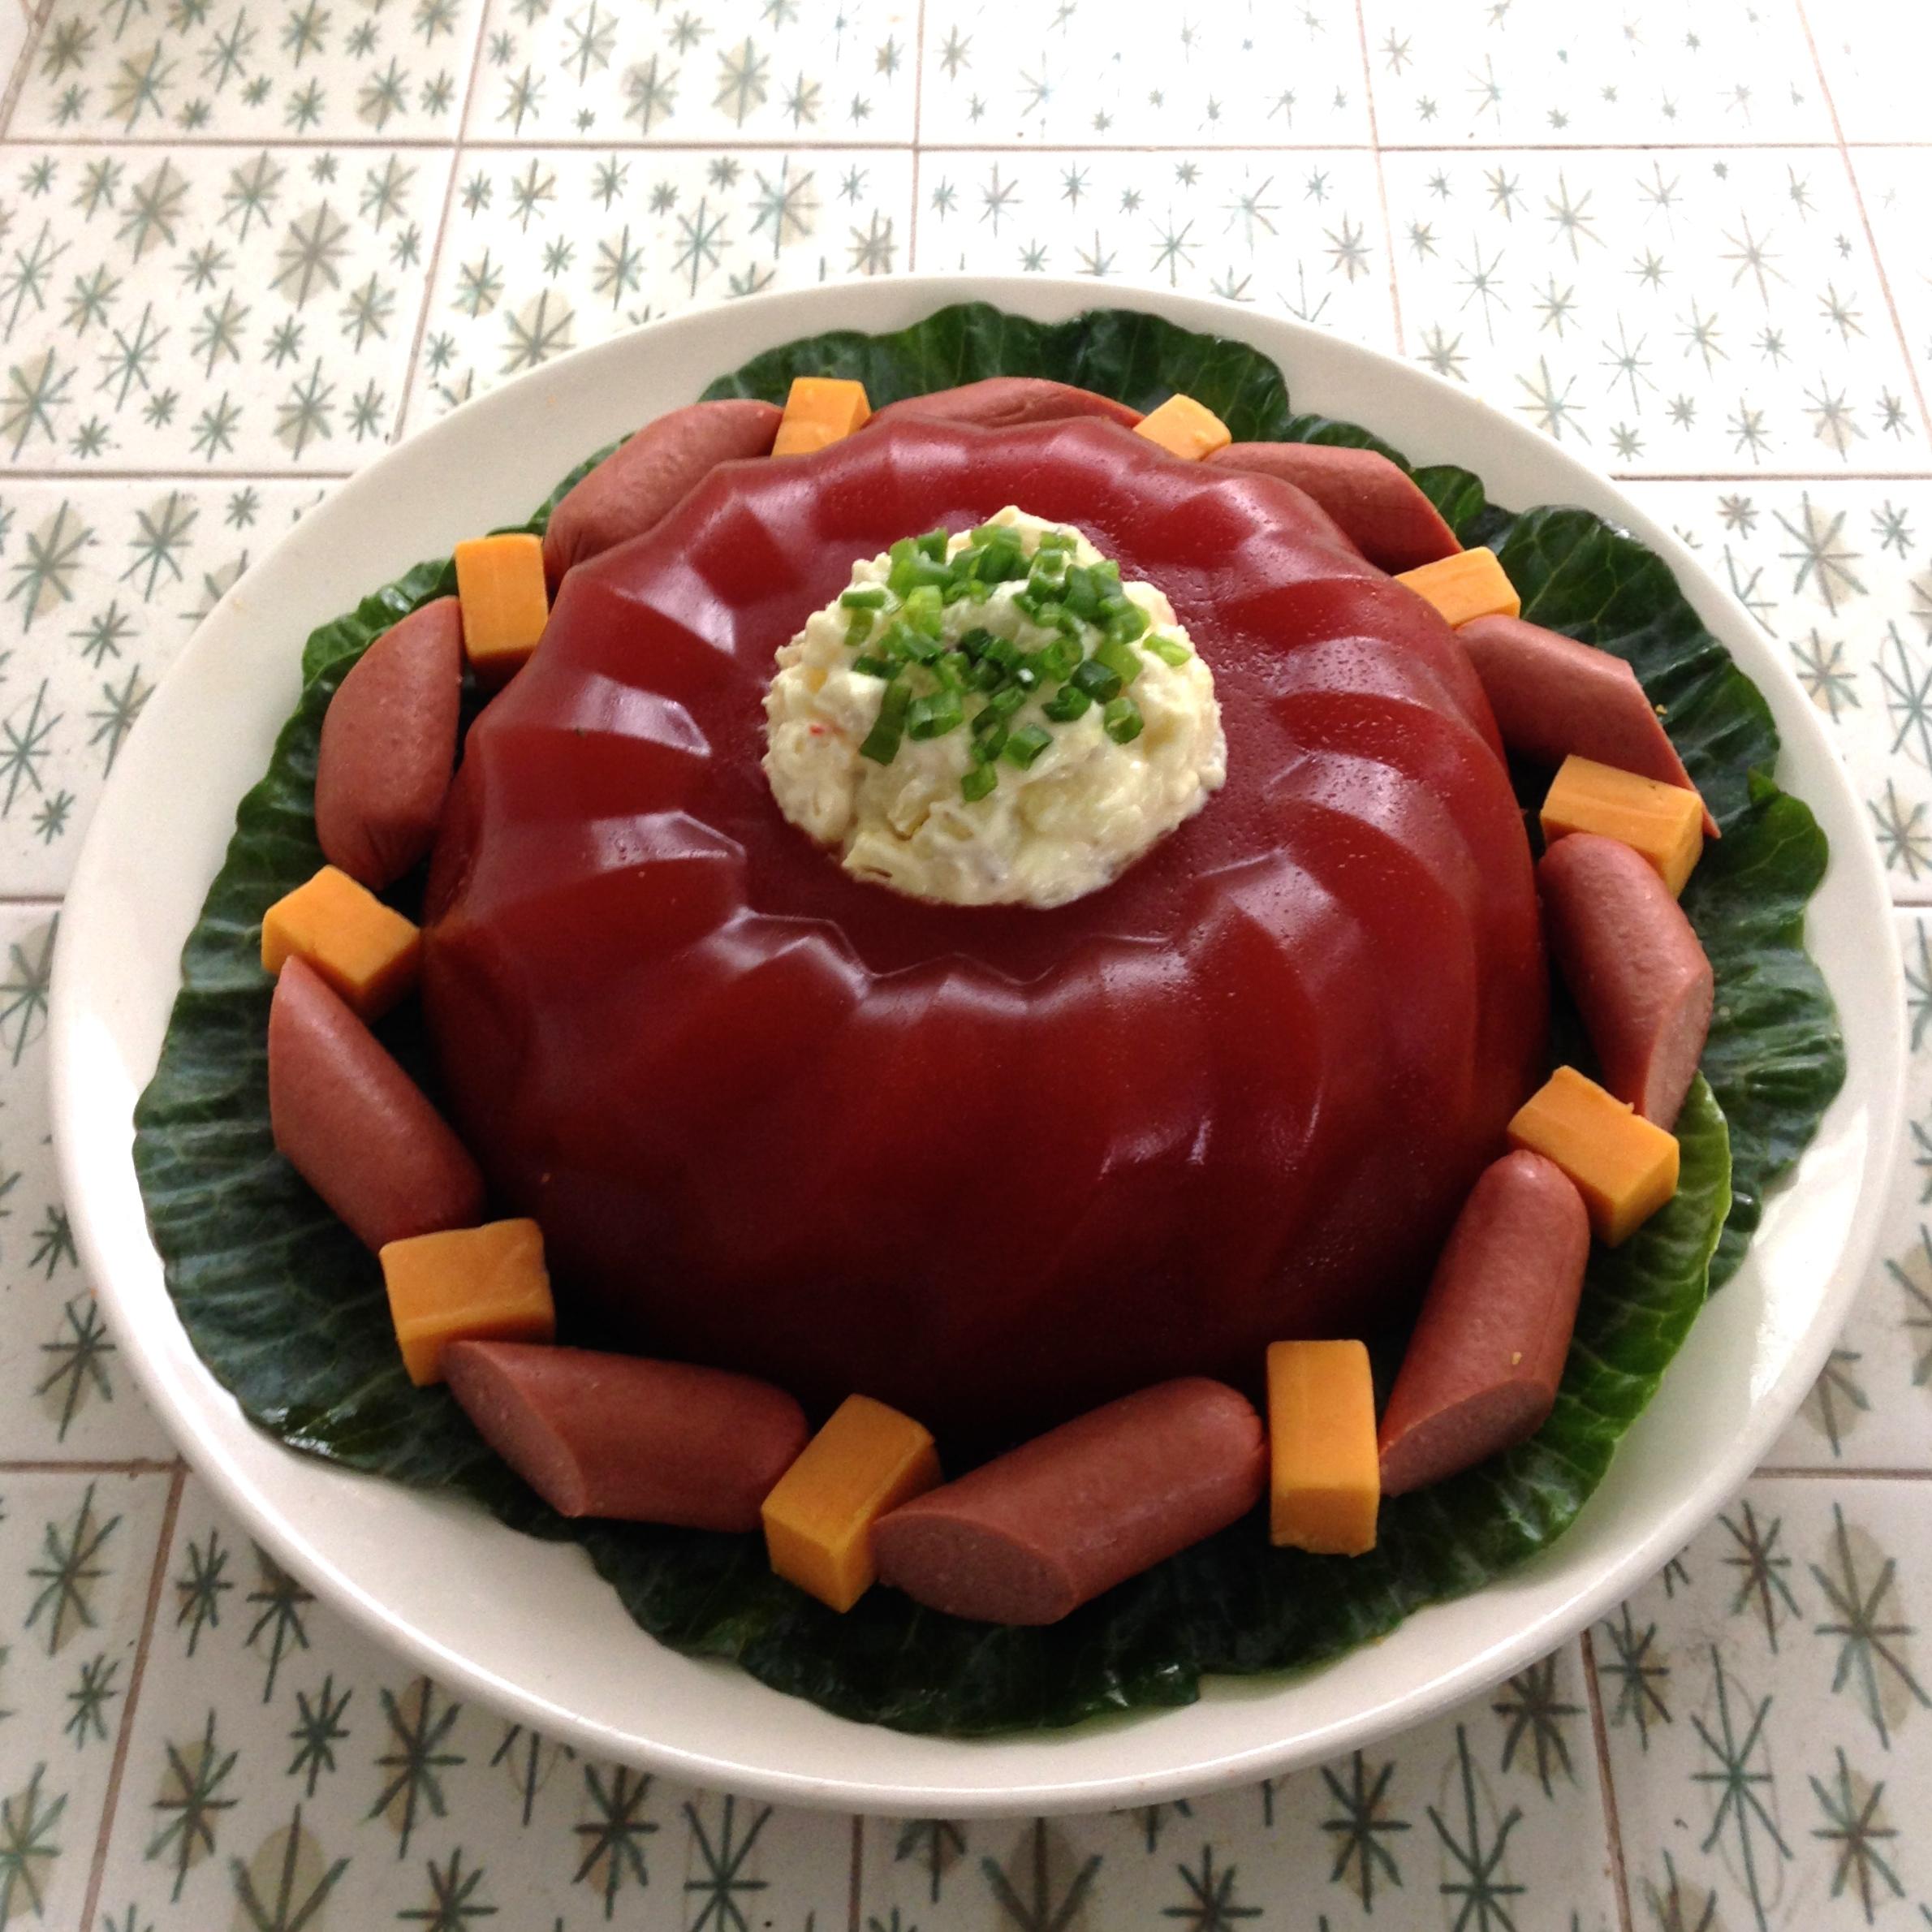 tomato mold copy.jpg